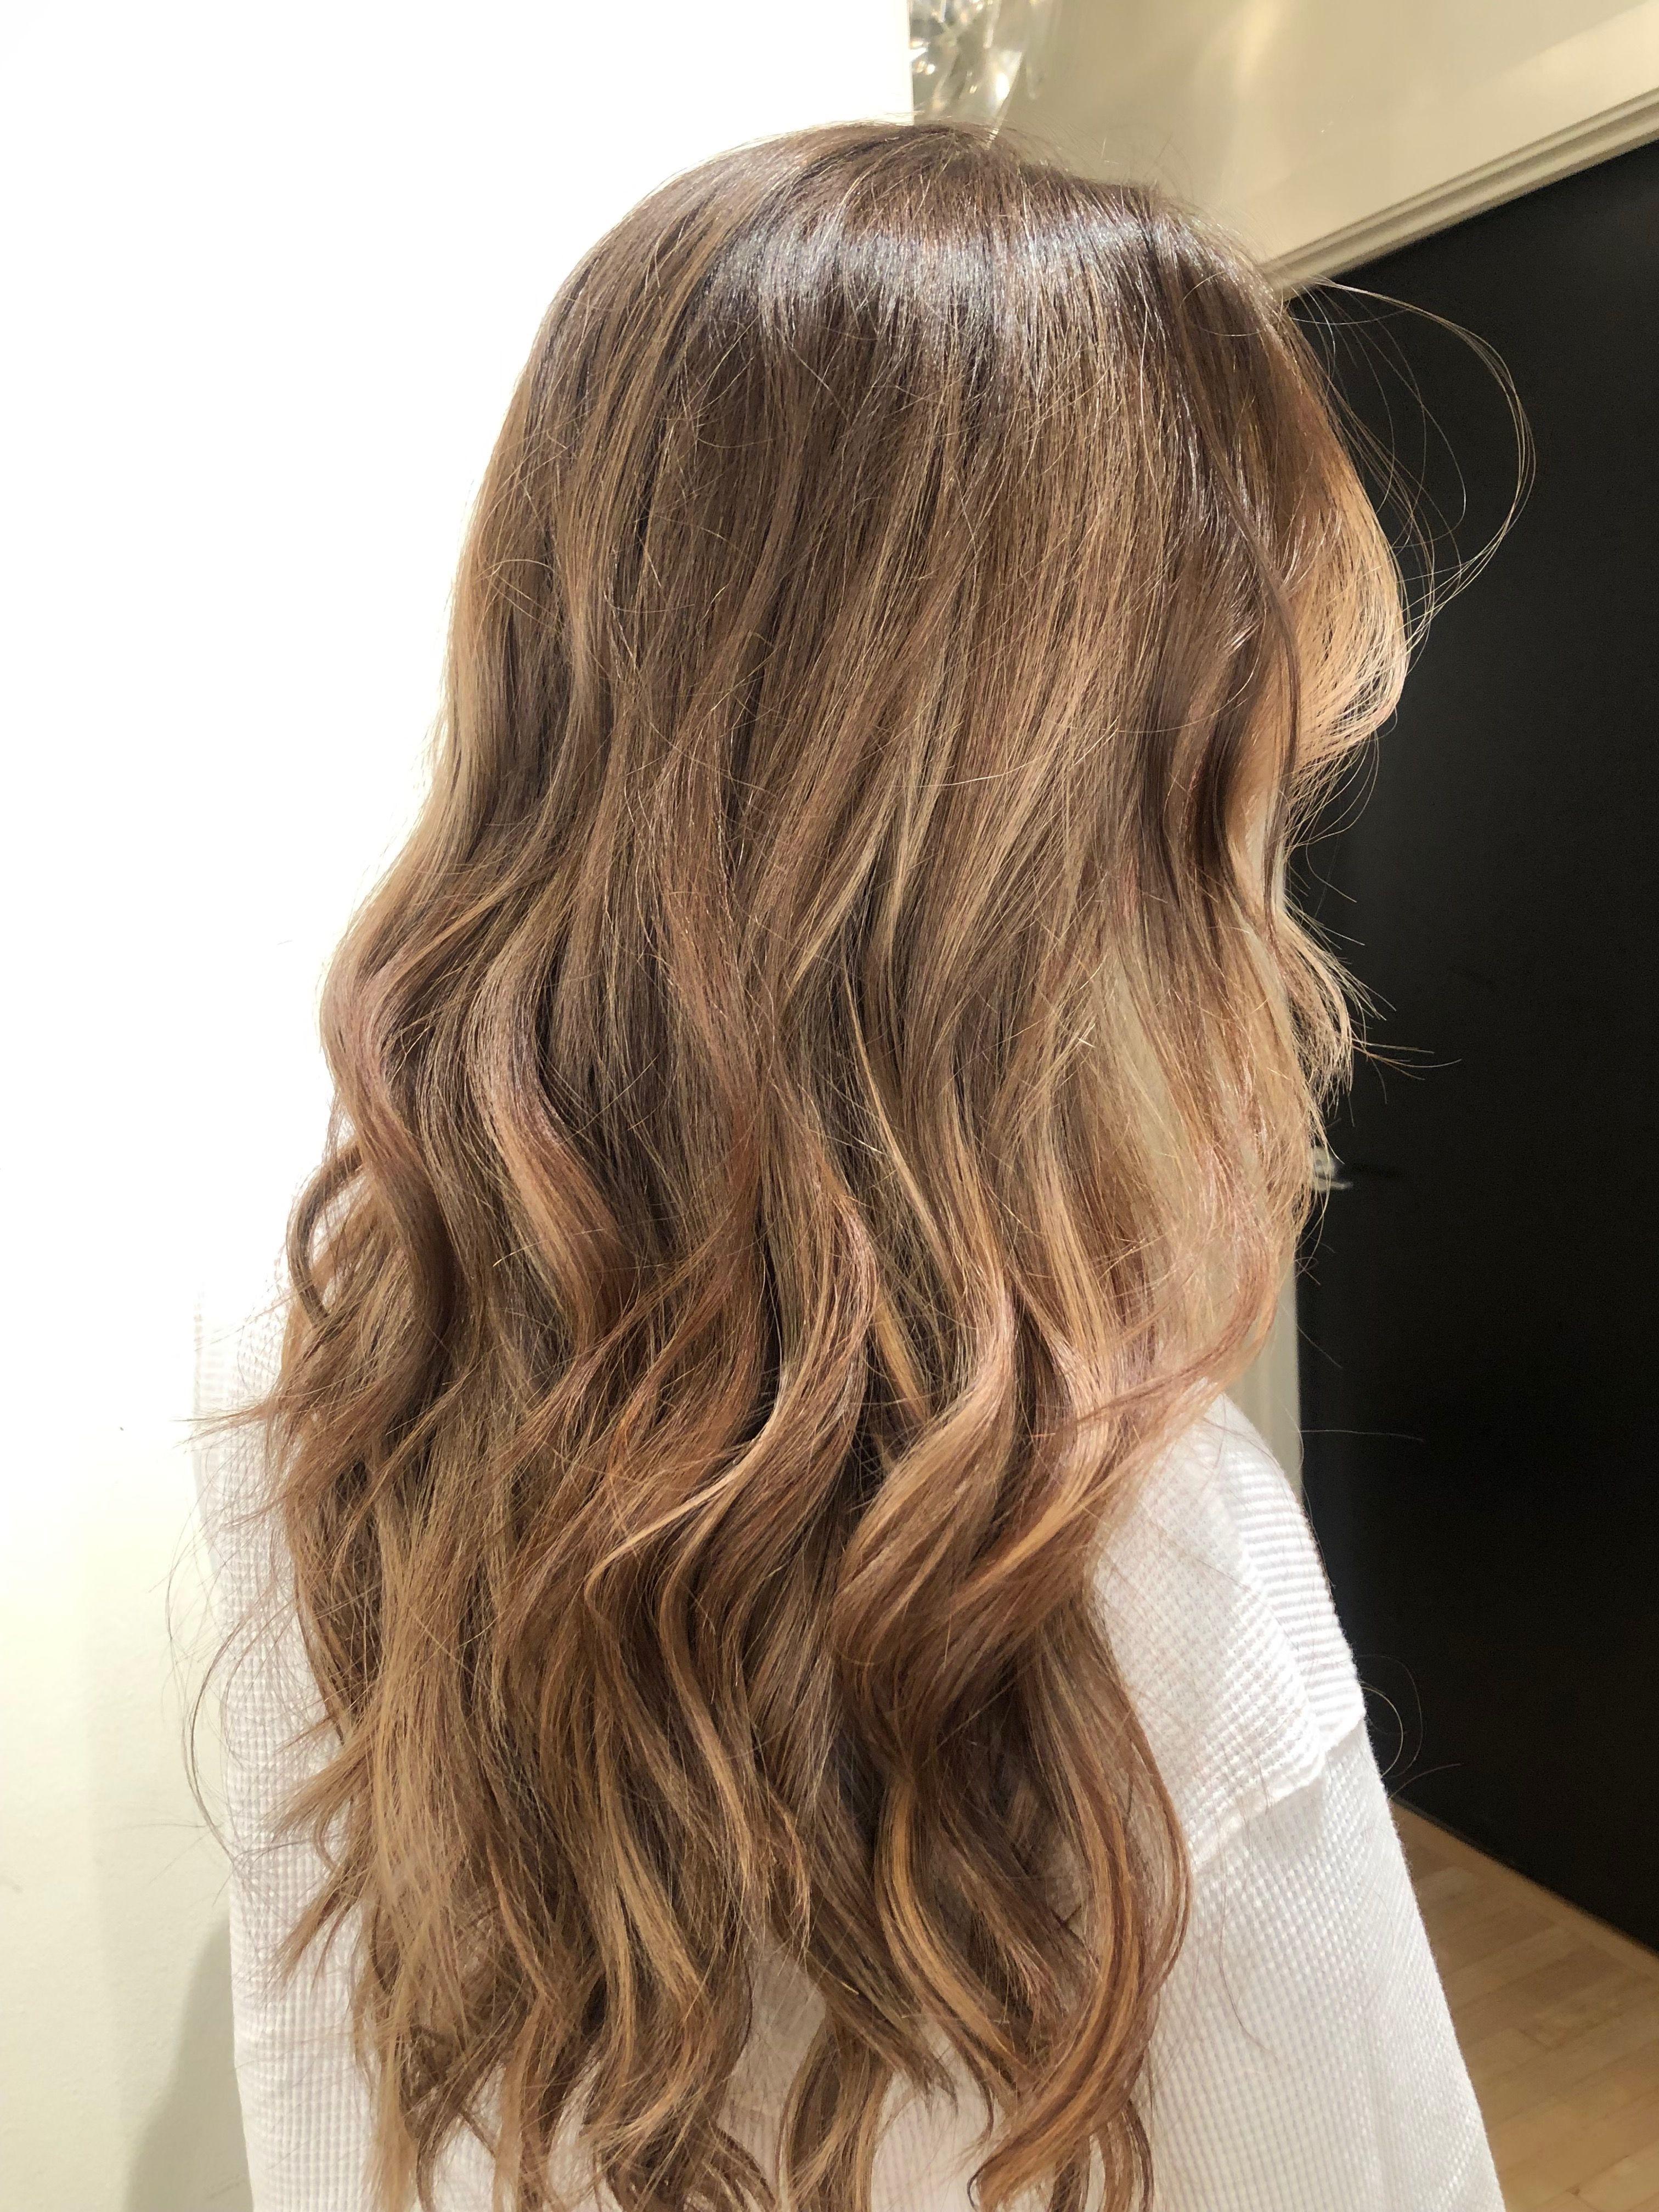 Hair Styled By Joseph Crowley And Color By Heather Ciskowski For Michael Michael Best Hair Salon Hair Styles Hair